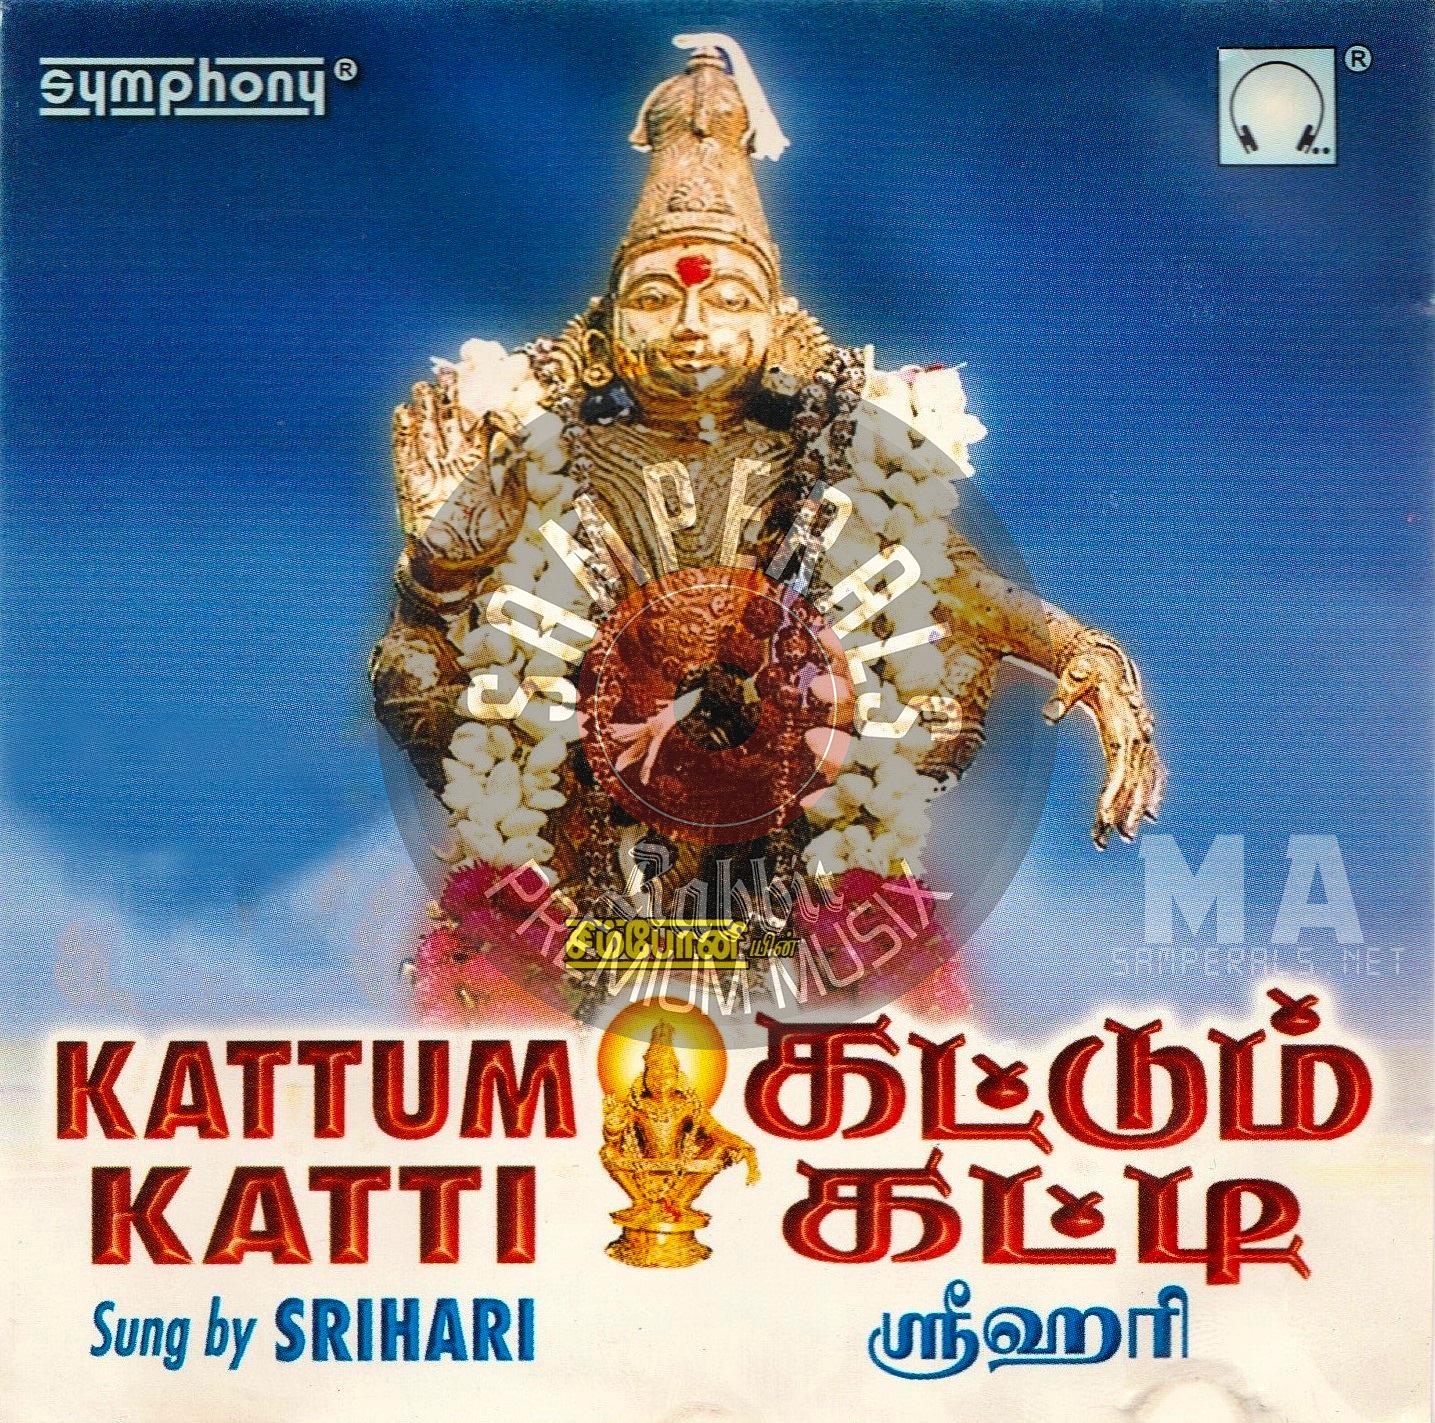 Kattum Katti Ayyappan Songs Download Srihari Songs Download Devotional Audio Cds Collections Tamil Fl Christmas Ornaments Holiday Decor Novelty Christmas